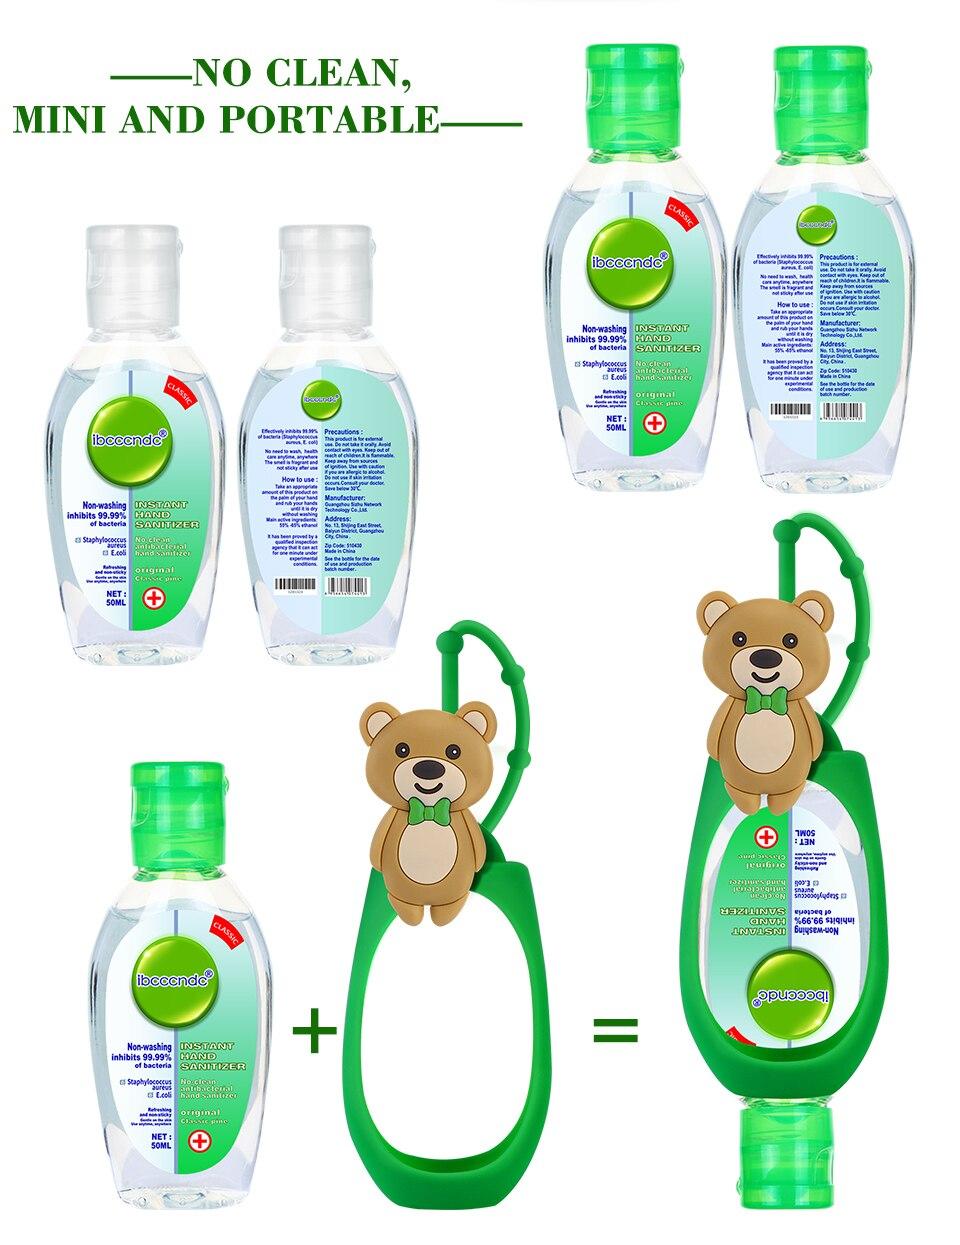 H41e93509f1a4402094c86539fc5e7563z 50ml Travel Portable Hand Sanitizer Gel Anti-Bacteria Moisturizing Liquid Disposable No Clean Waterless Antibacterial Hand Gel